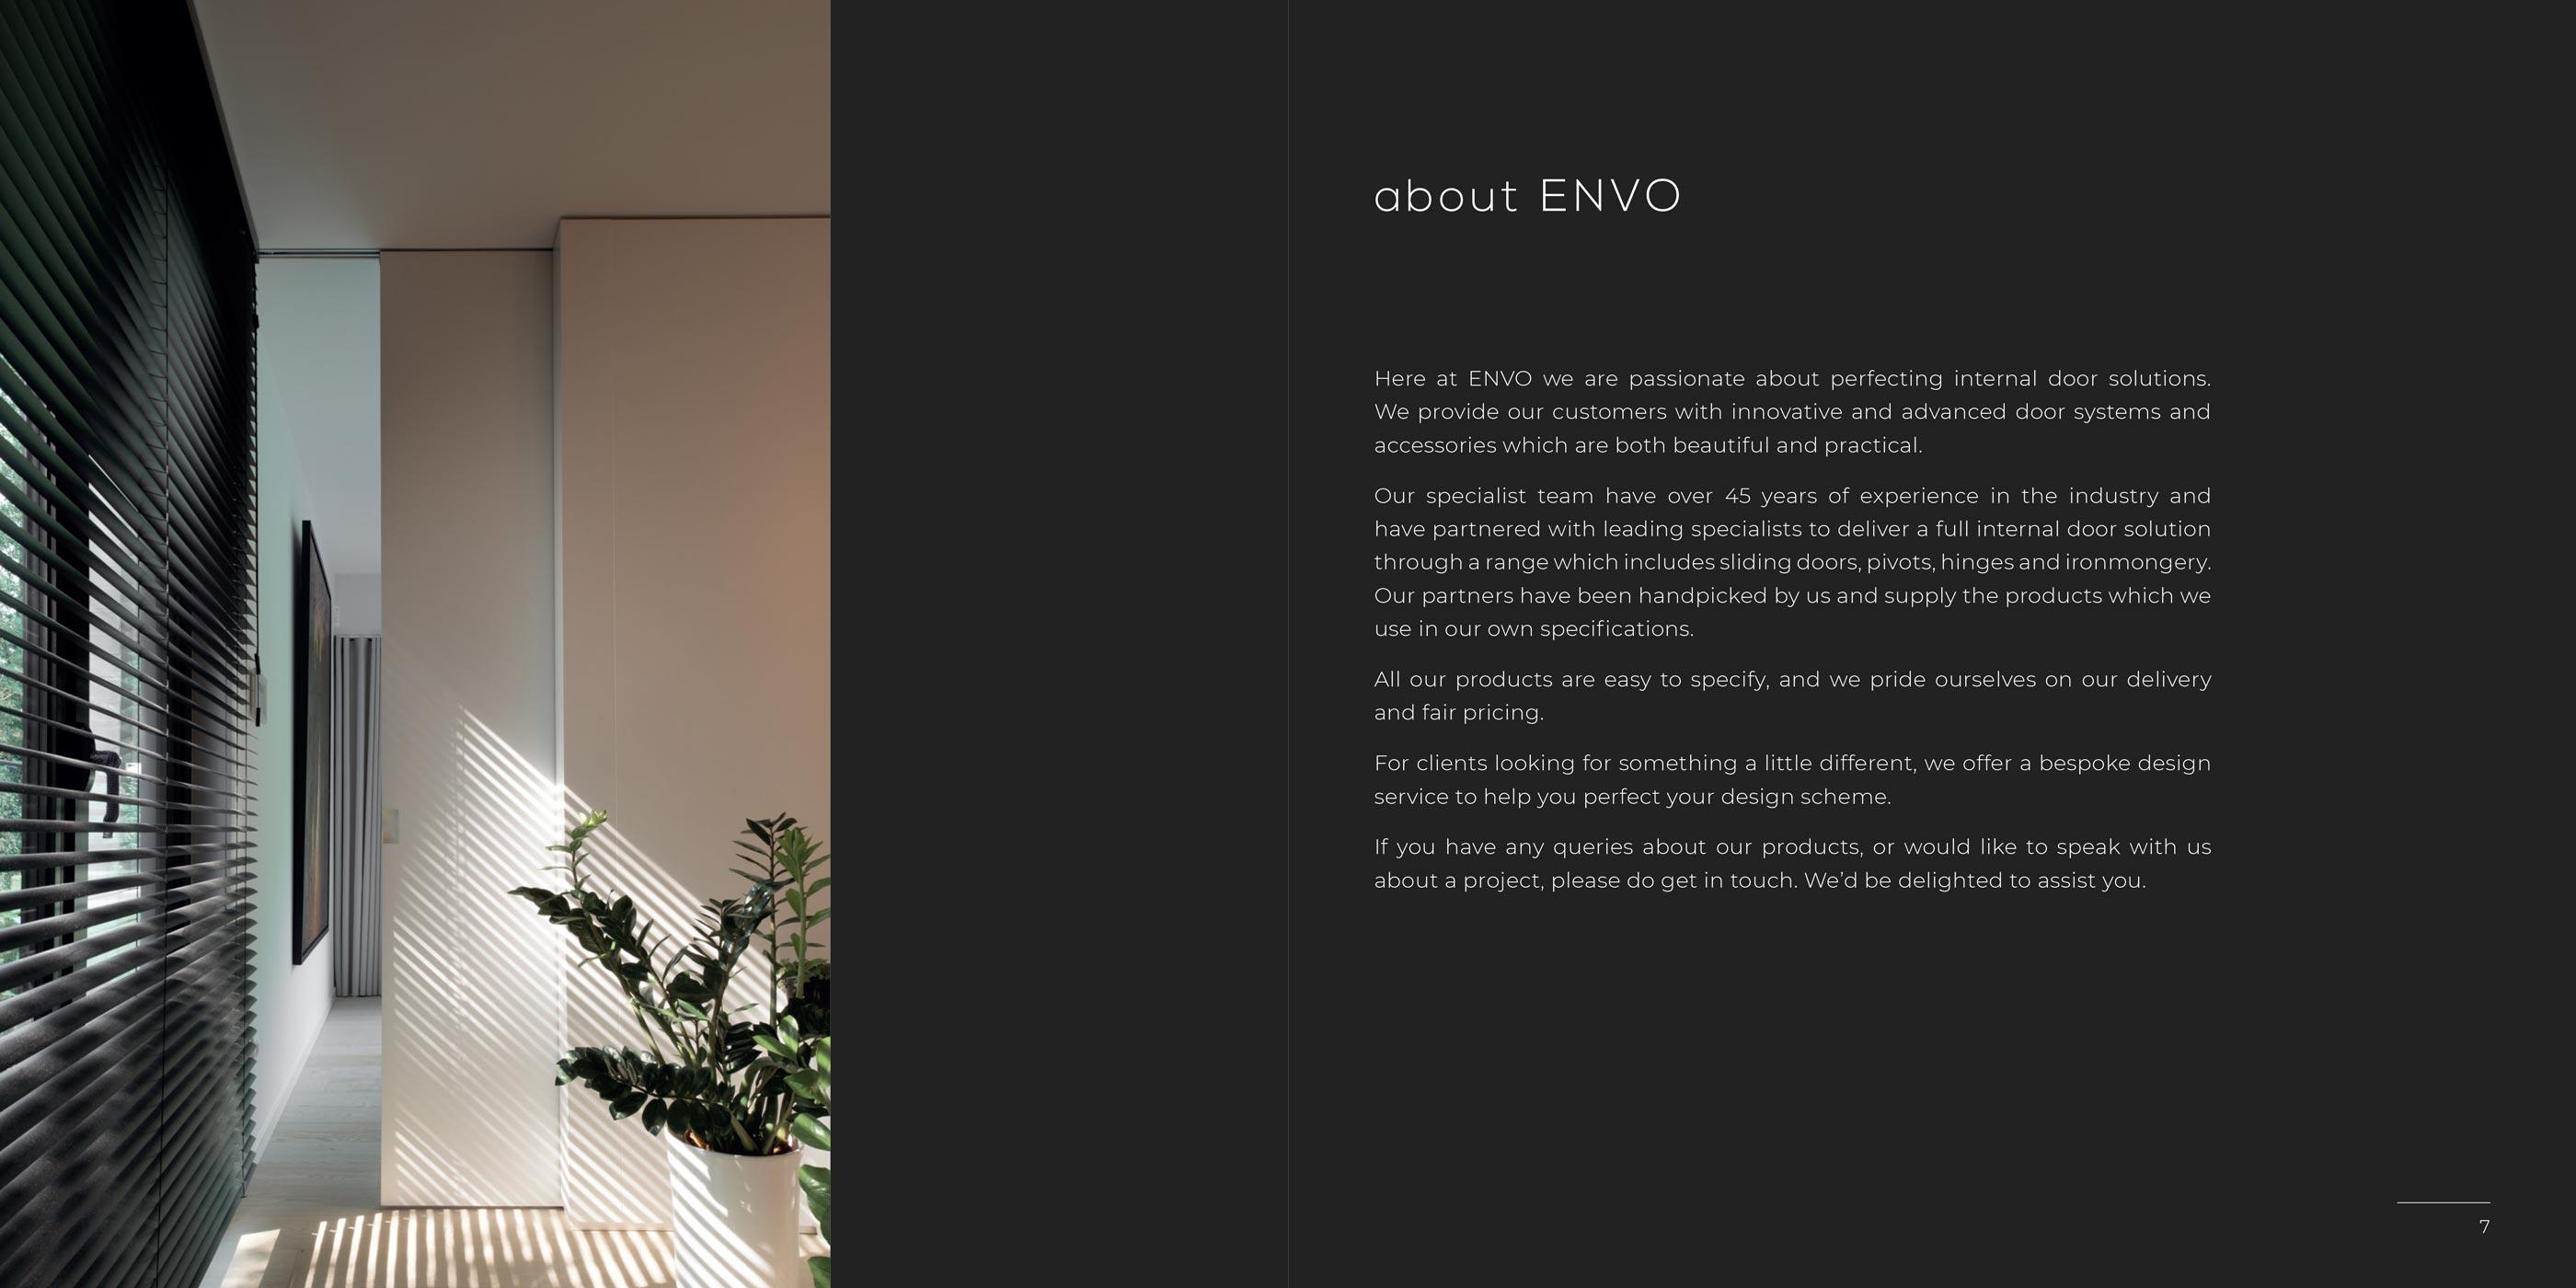 ENVO_Book_02